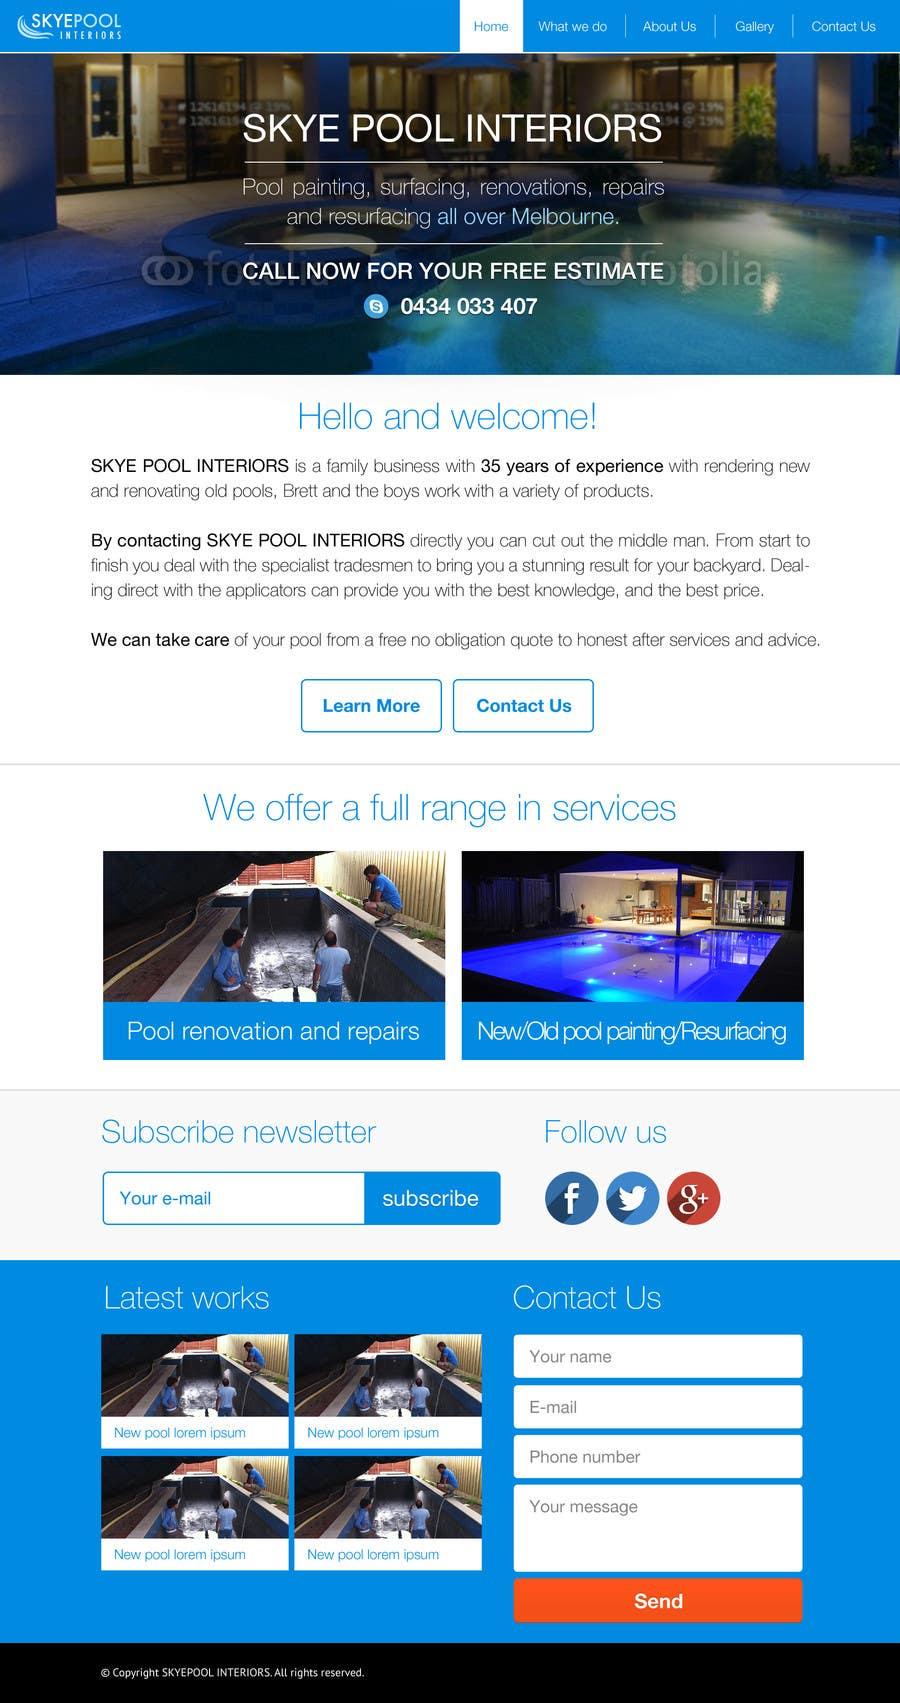 Bài tham dự cuộc thi #                                        39                                      cho                                         Design a Website Mockup/Including Logo for Pool Renovation company